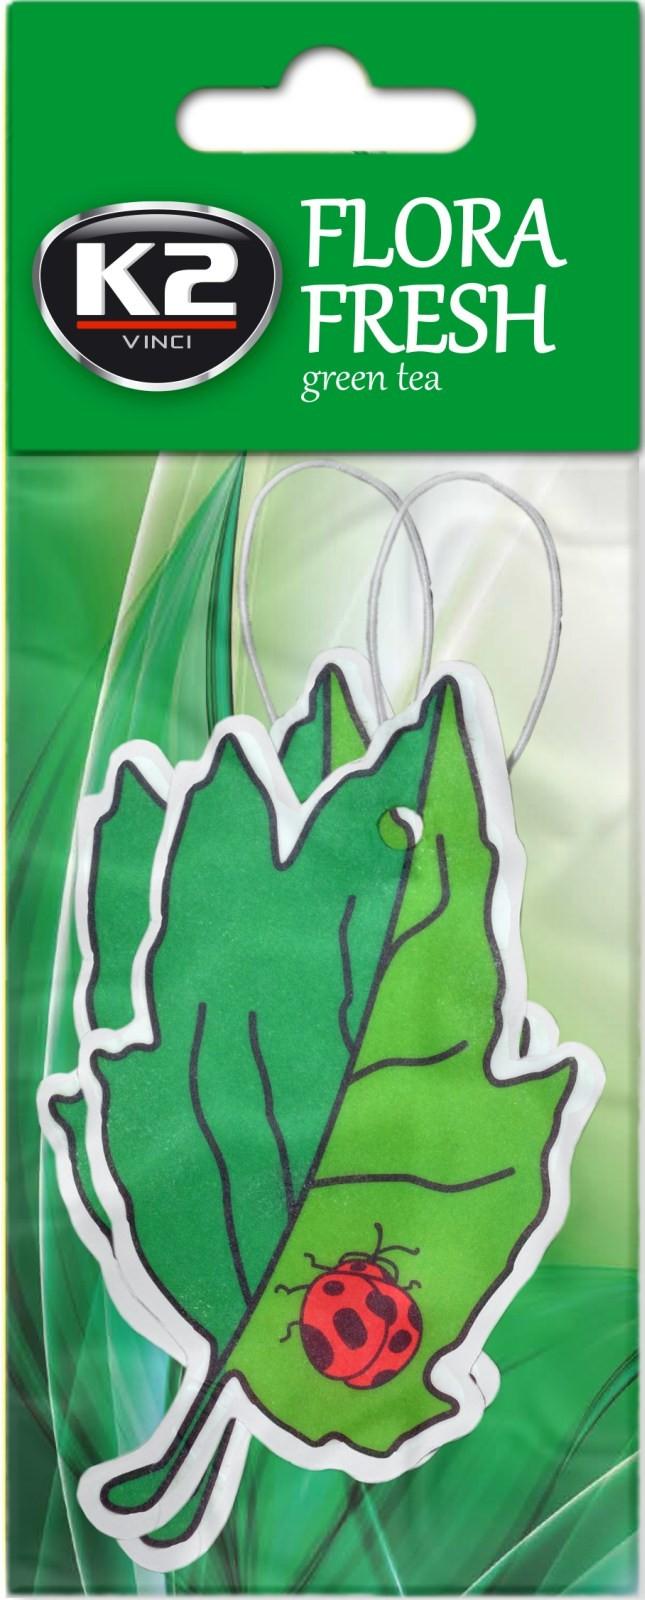 K2 FLORA FRESH GREEN TEA DUOPACK